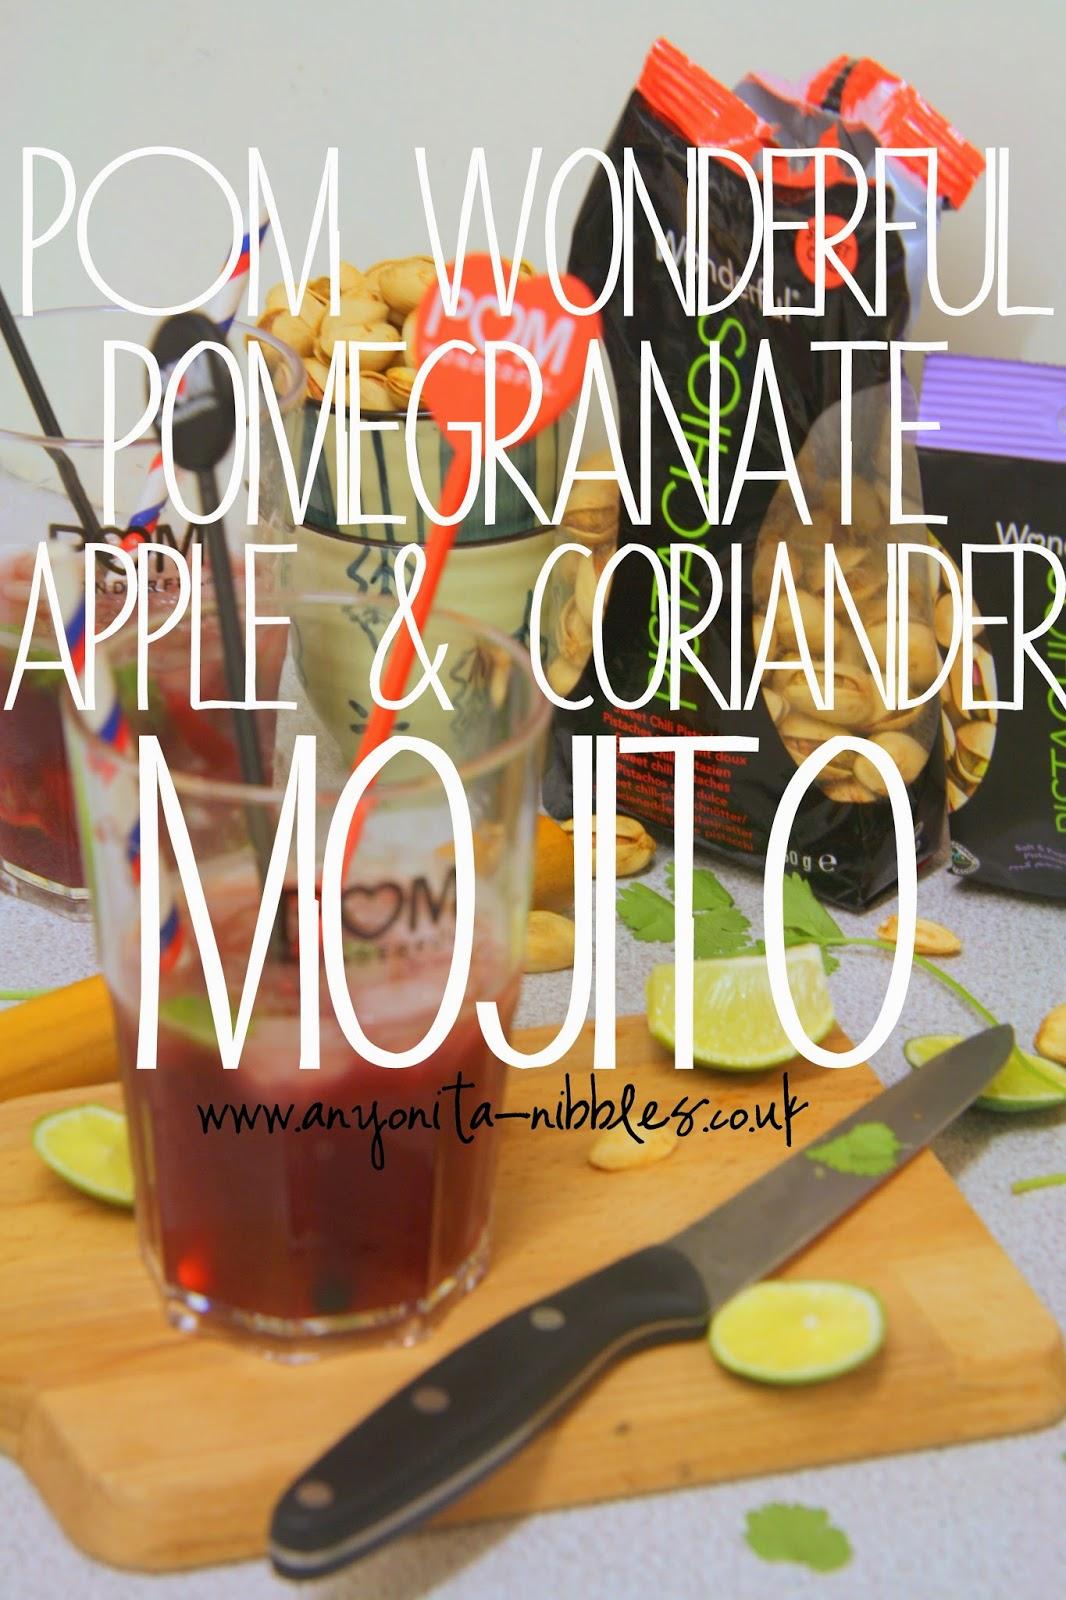 Pomegranate, Apple & Coriander Mojito from Anyonita Nibbles